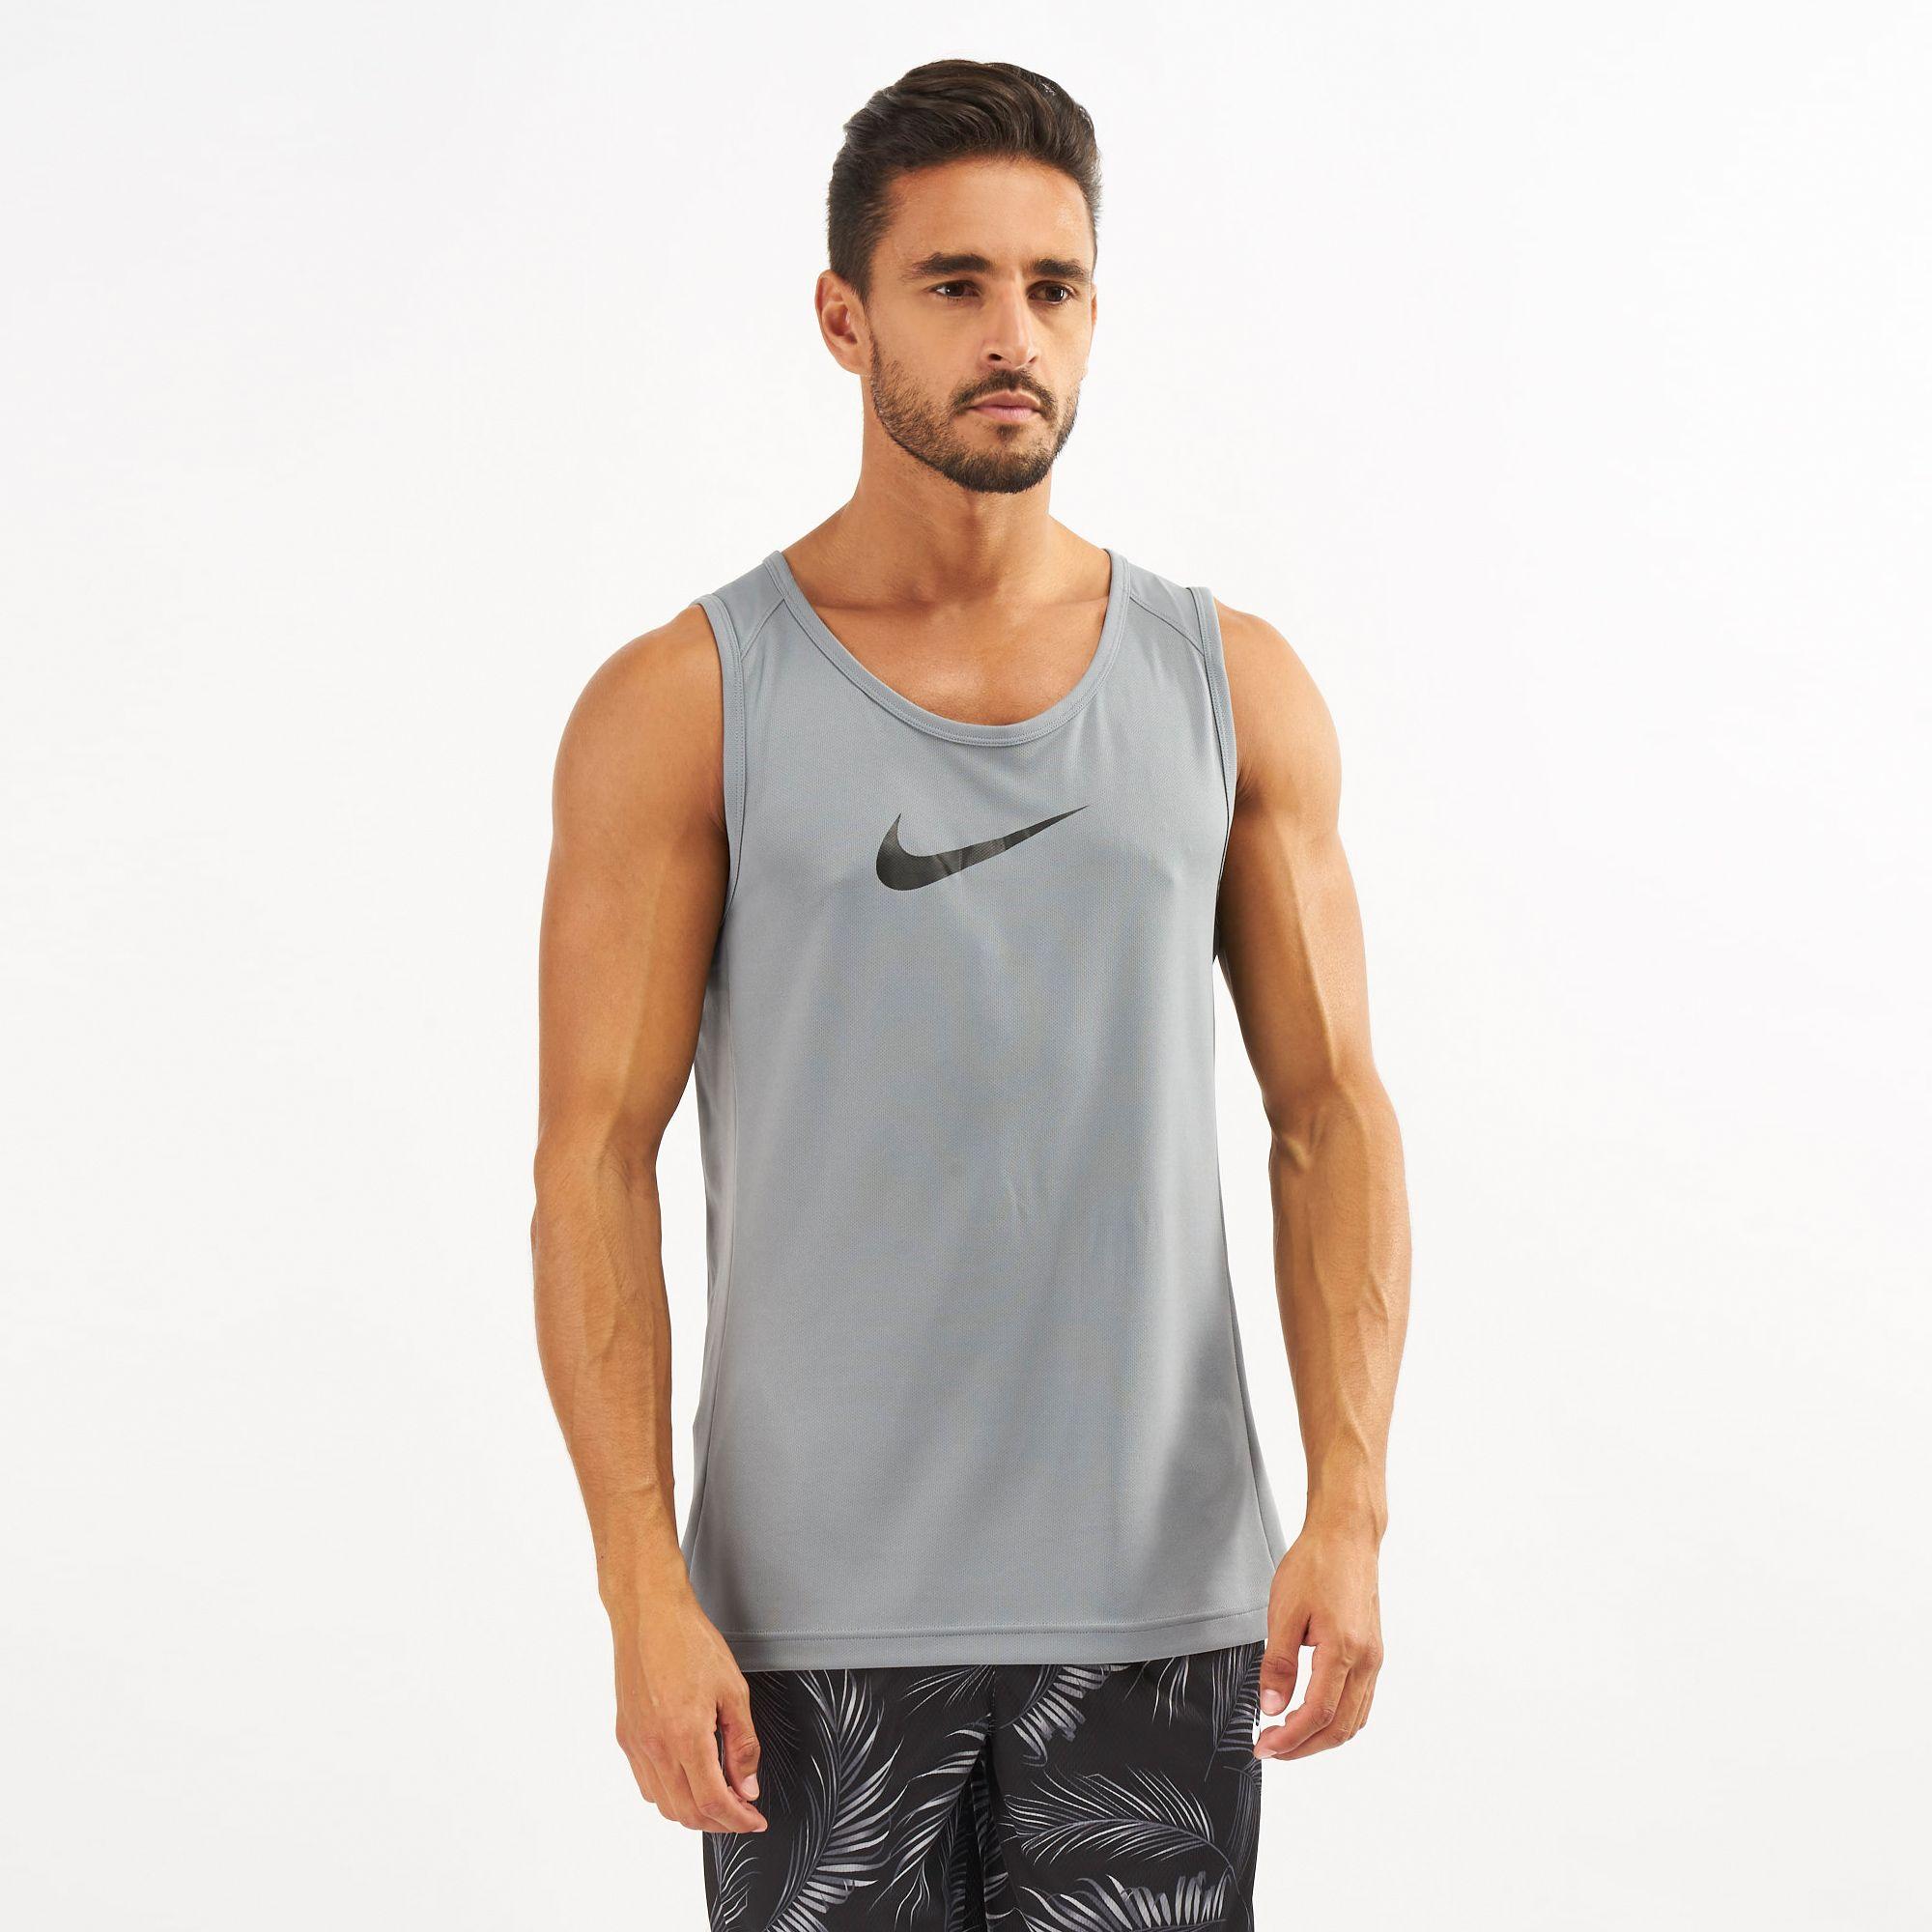 00706d8e01d84 Nike Dry Crossover Sleeveless Basketball Tank Top